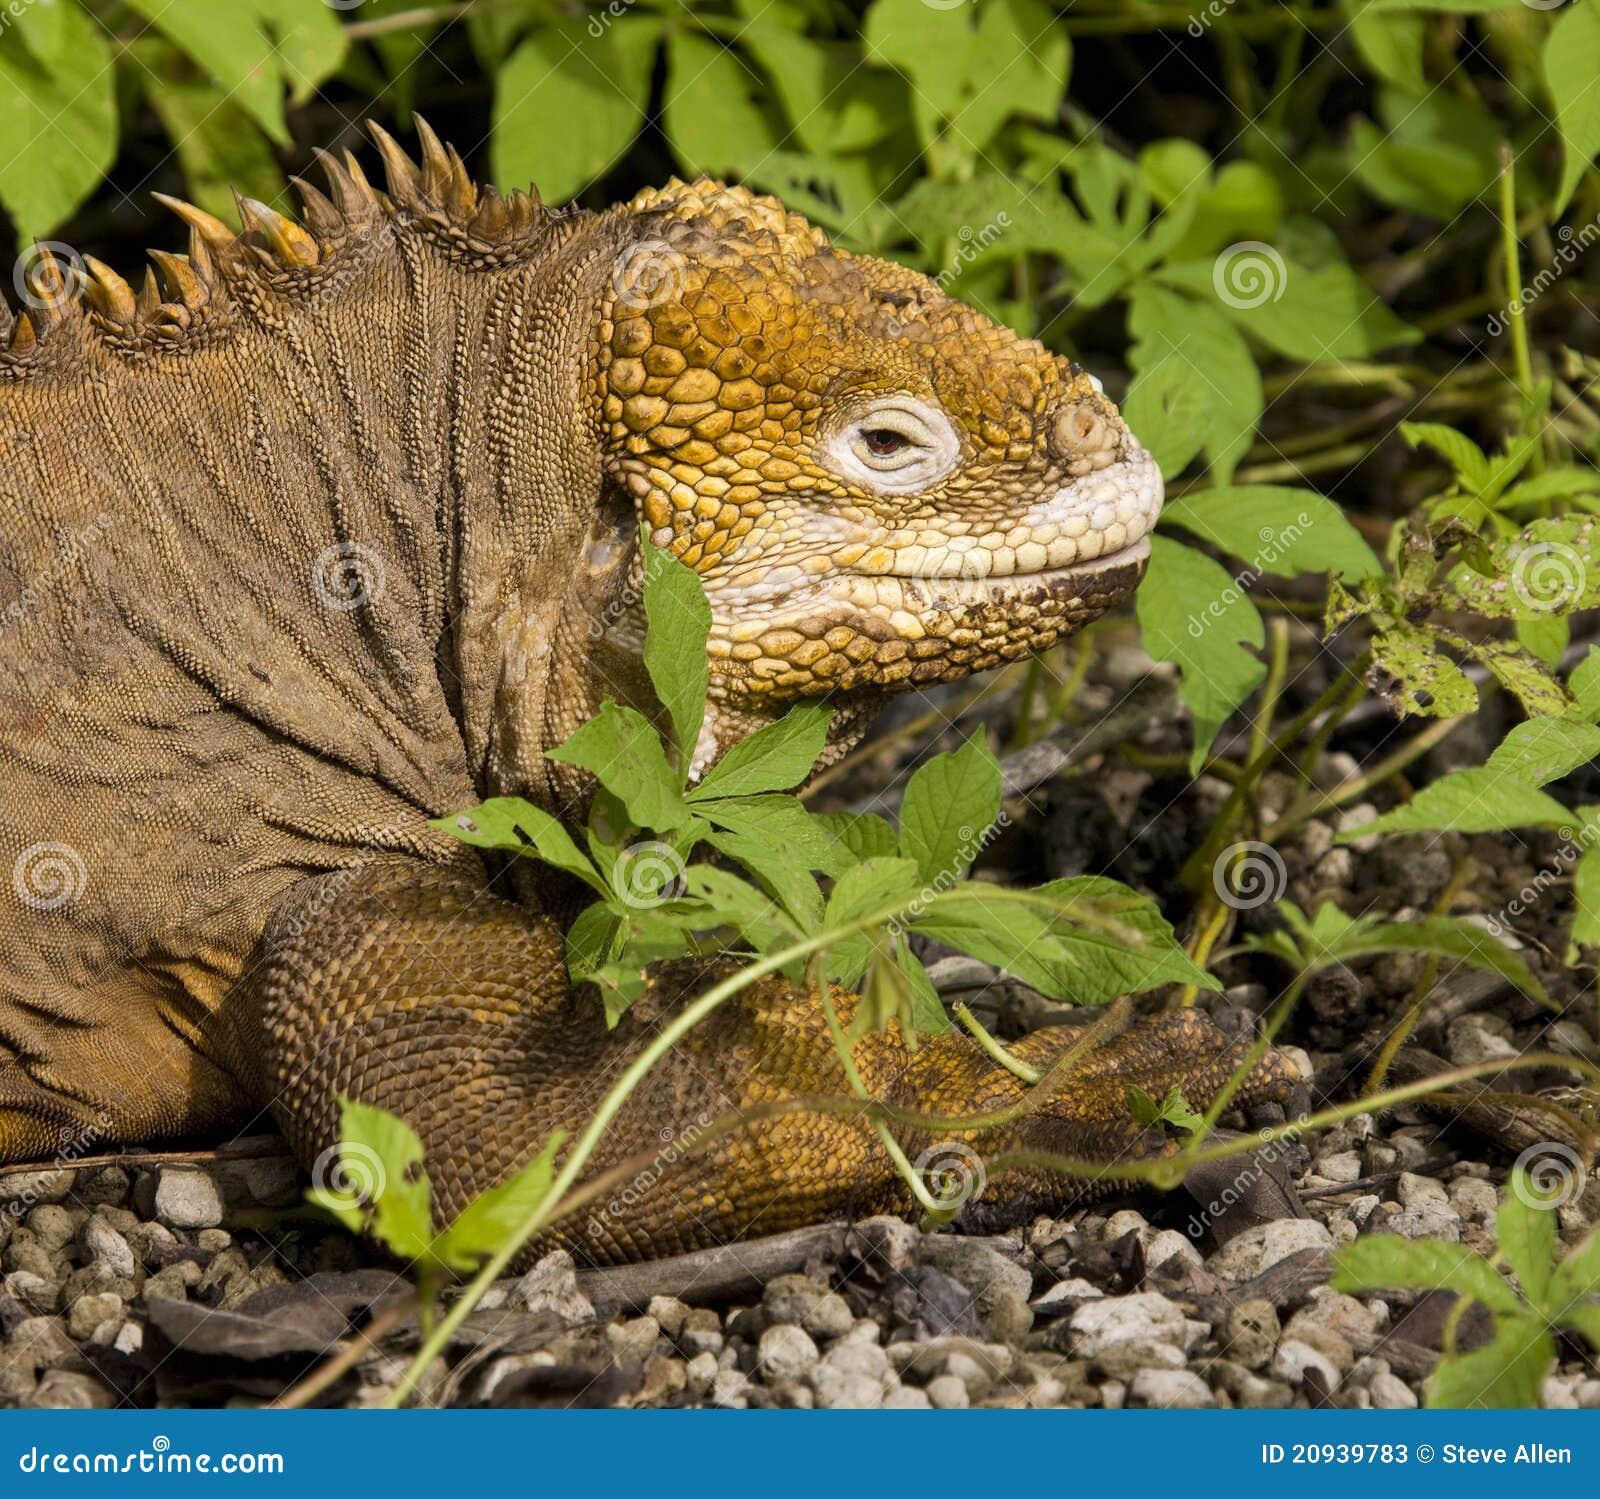 De Leguaan van het land - de Eilanden van de Galapagos - Ecuador